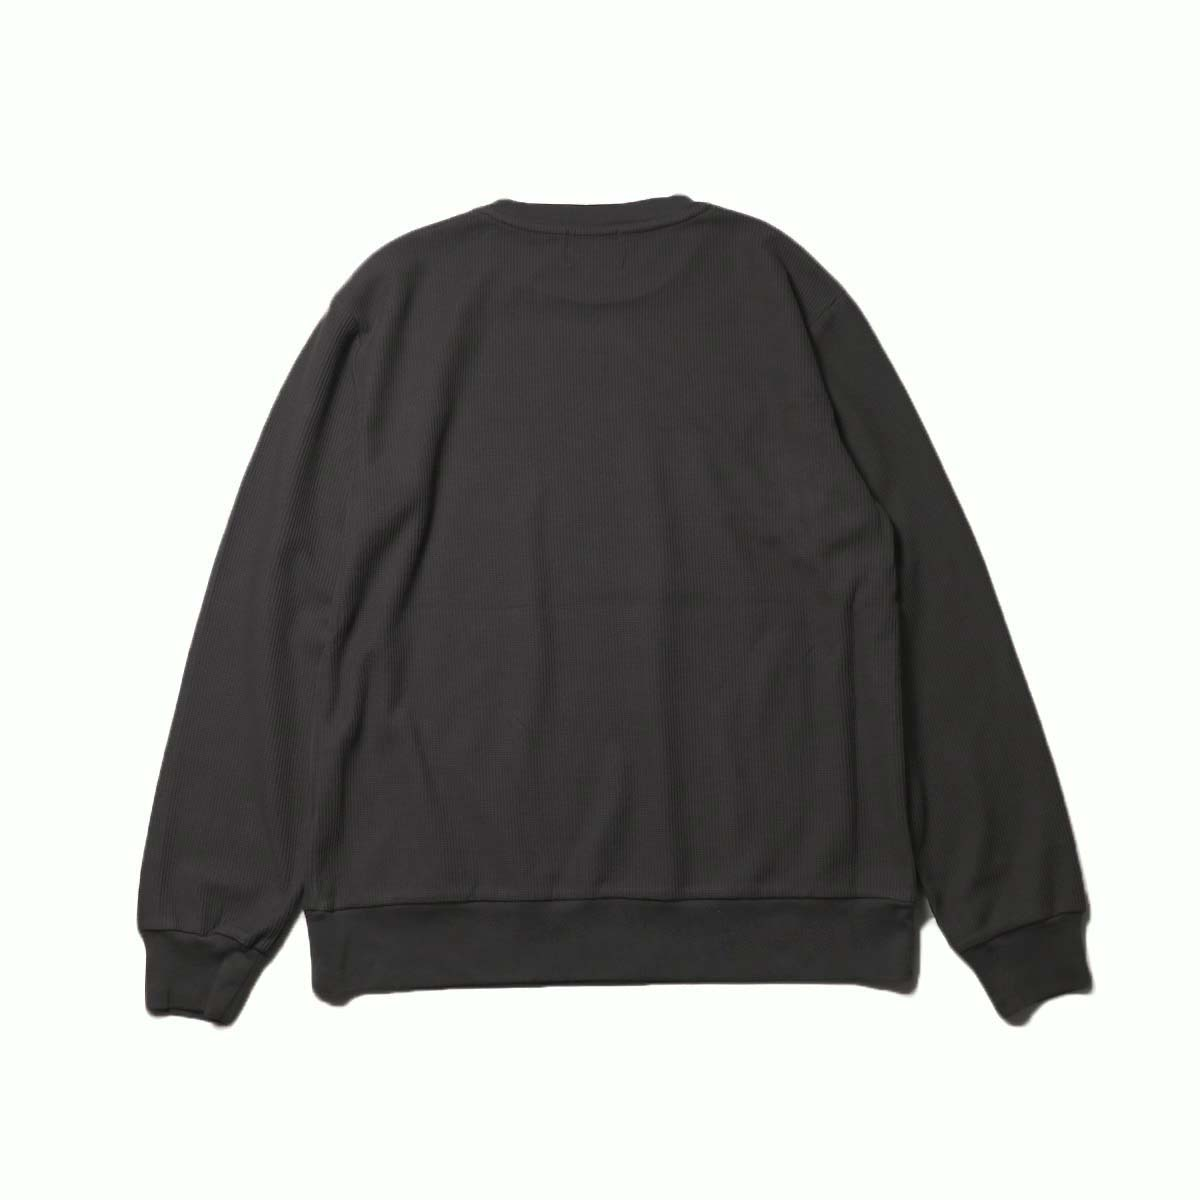 blurhms / New Rough & Smooth Thermal P/O Regular Fit (Black)背面